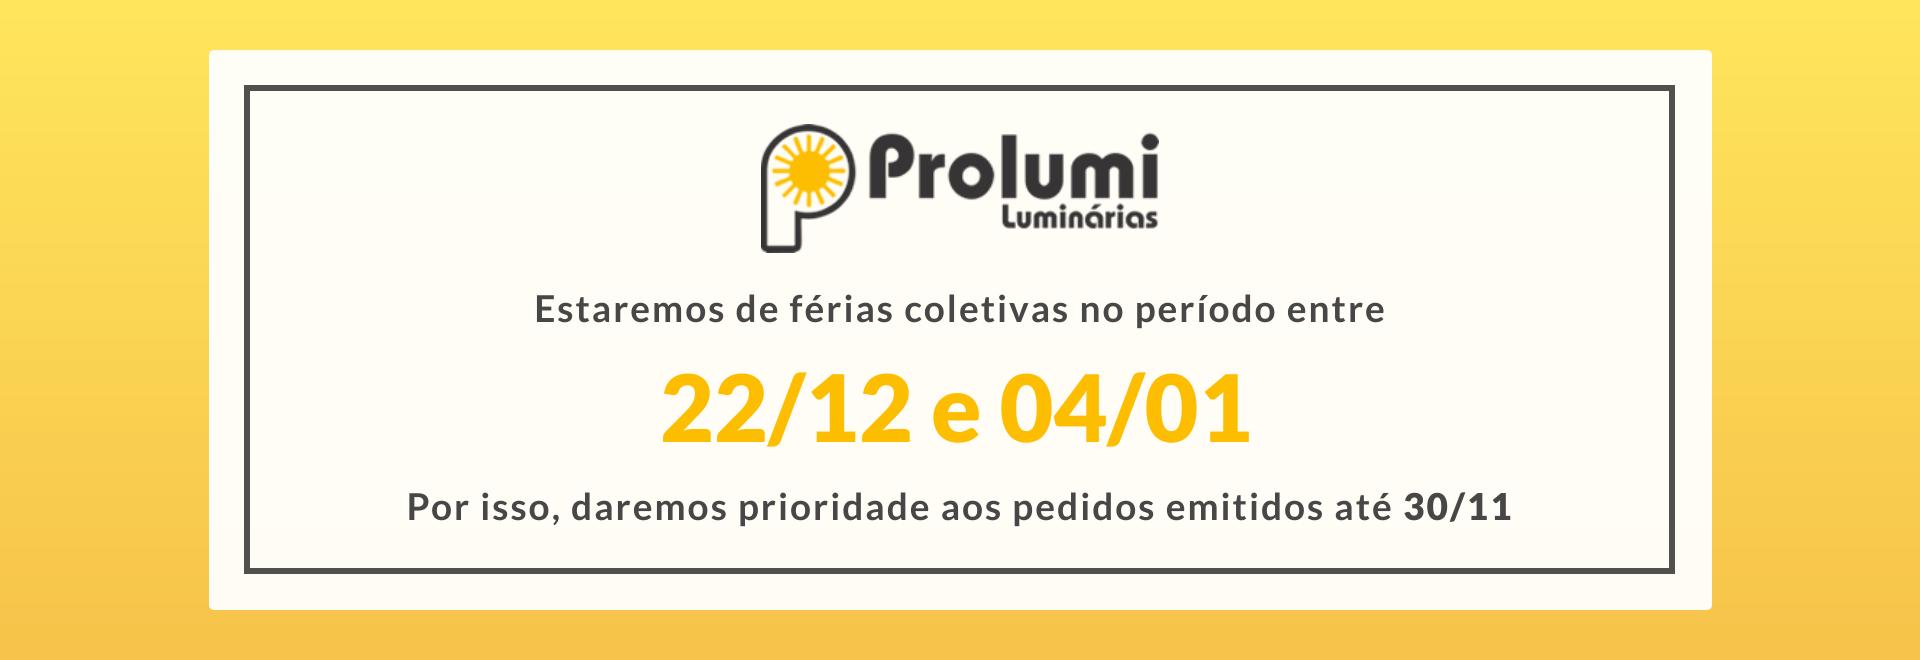 prolumi-banner-site-informativo-ferias-coletiva